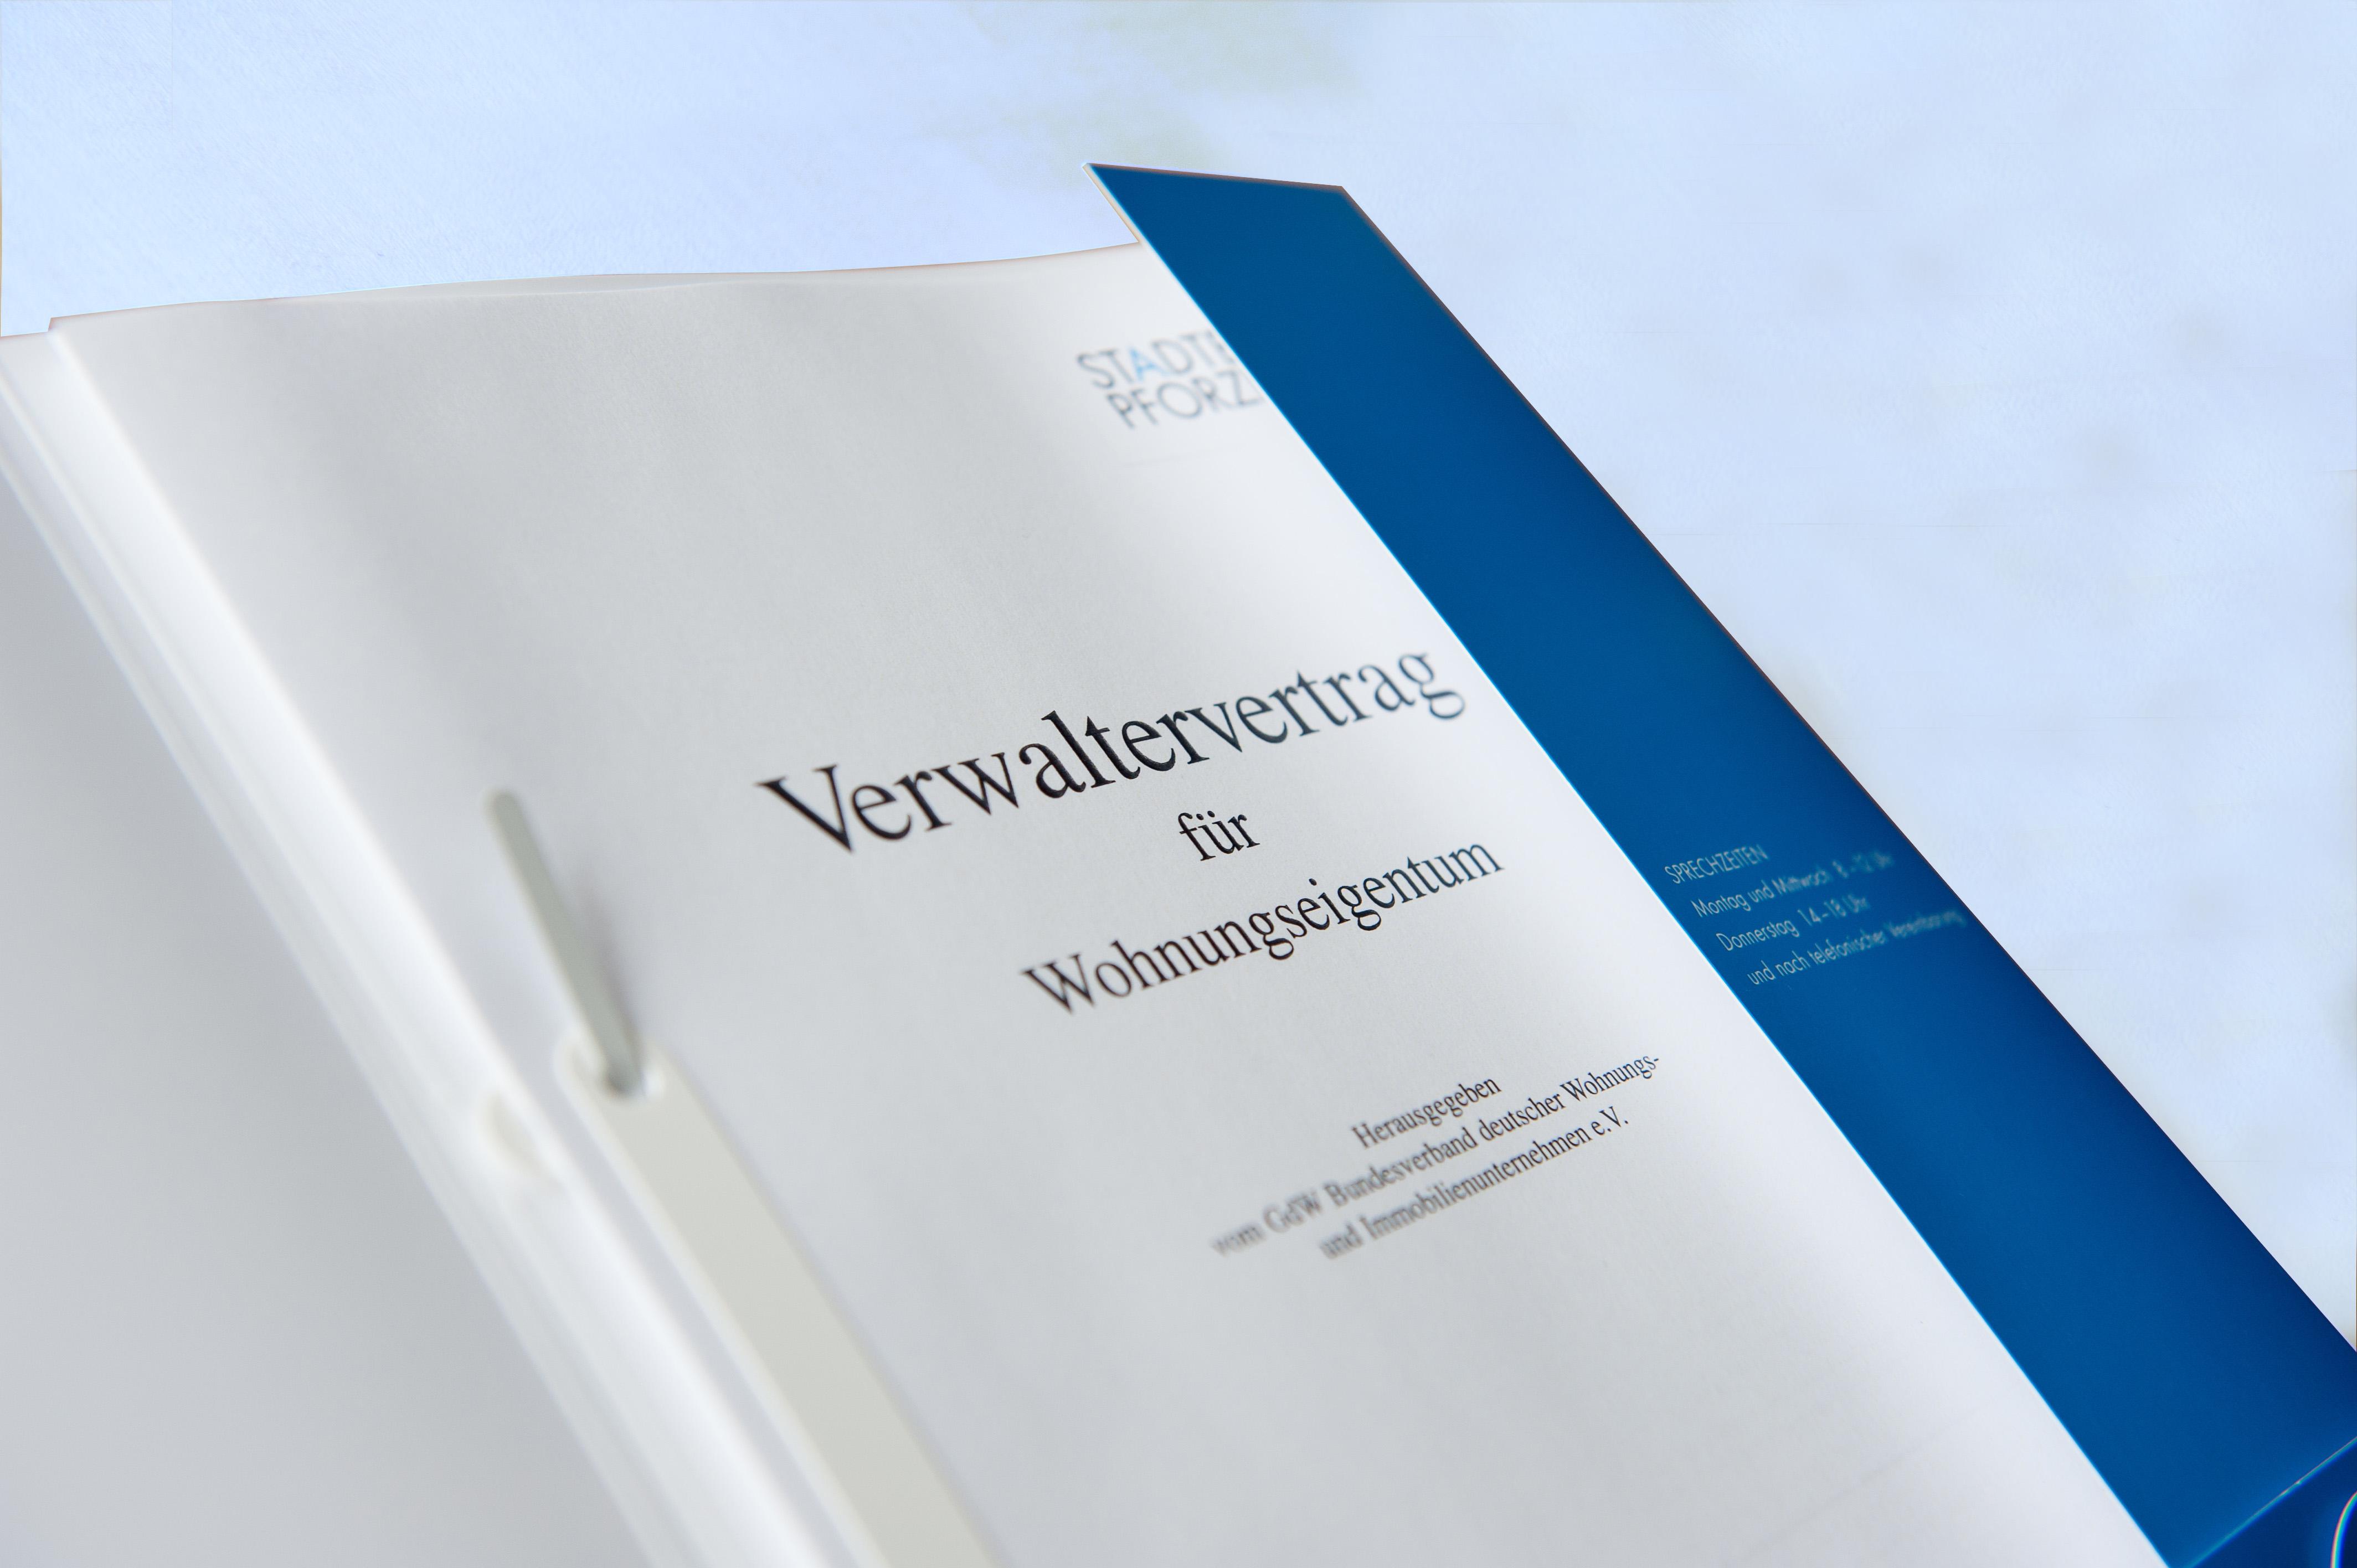 stadtbau-pforzheim_weg_image_002-kopie